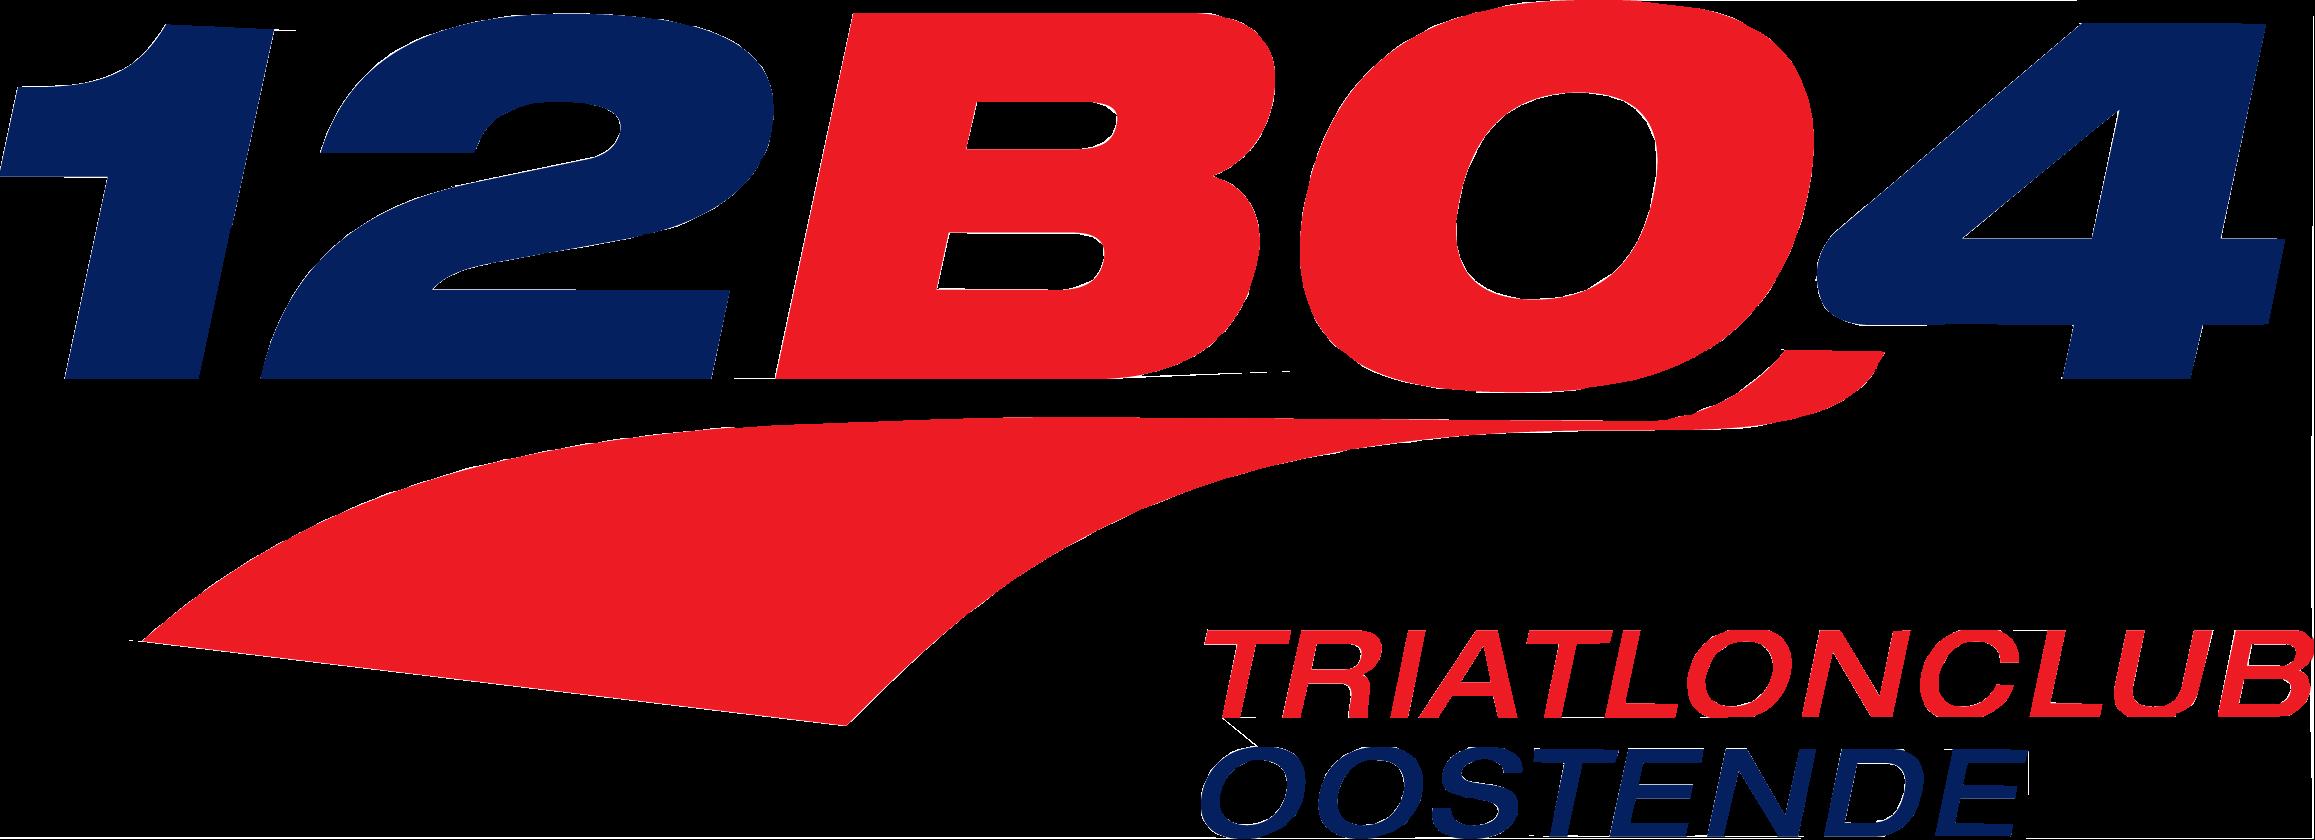 Triatlonteam 12beaufort